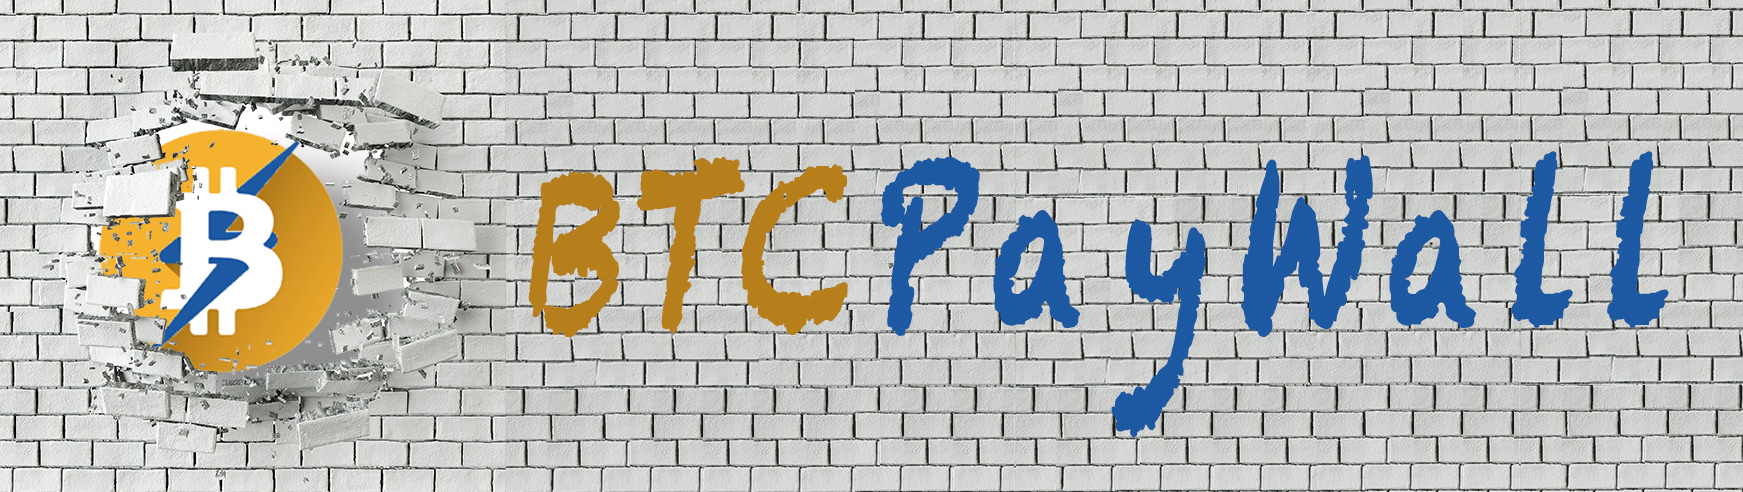 BTCPayWall - Bitcoin Paywall for WordPress